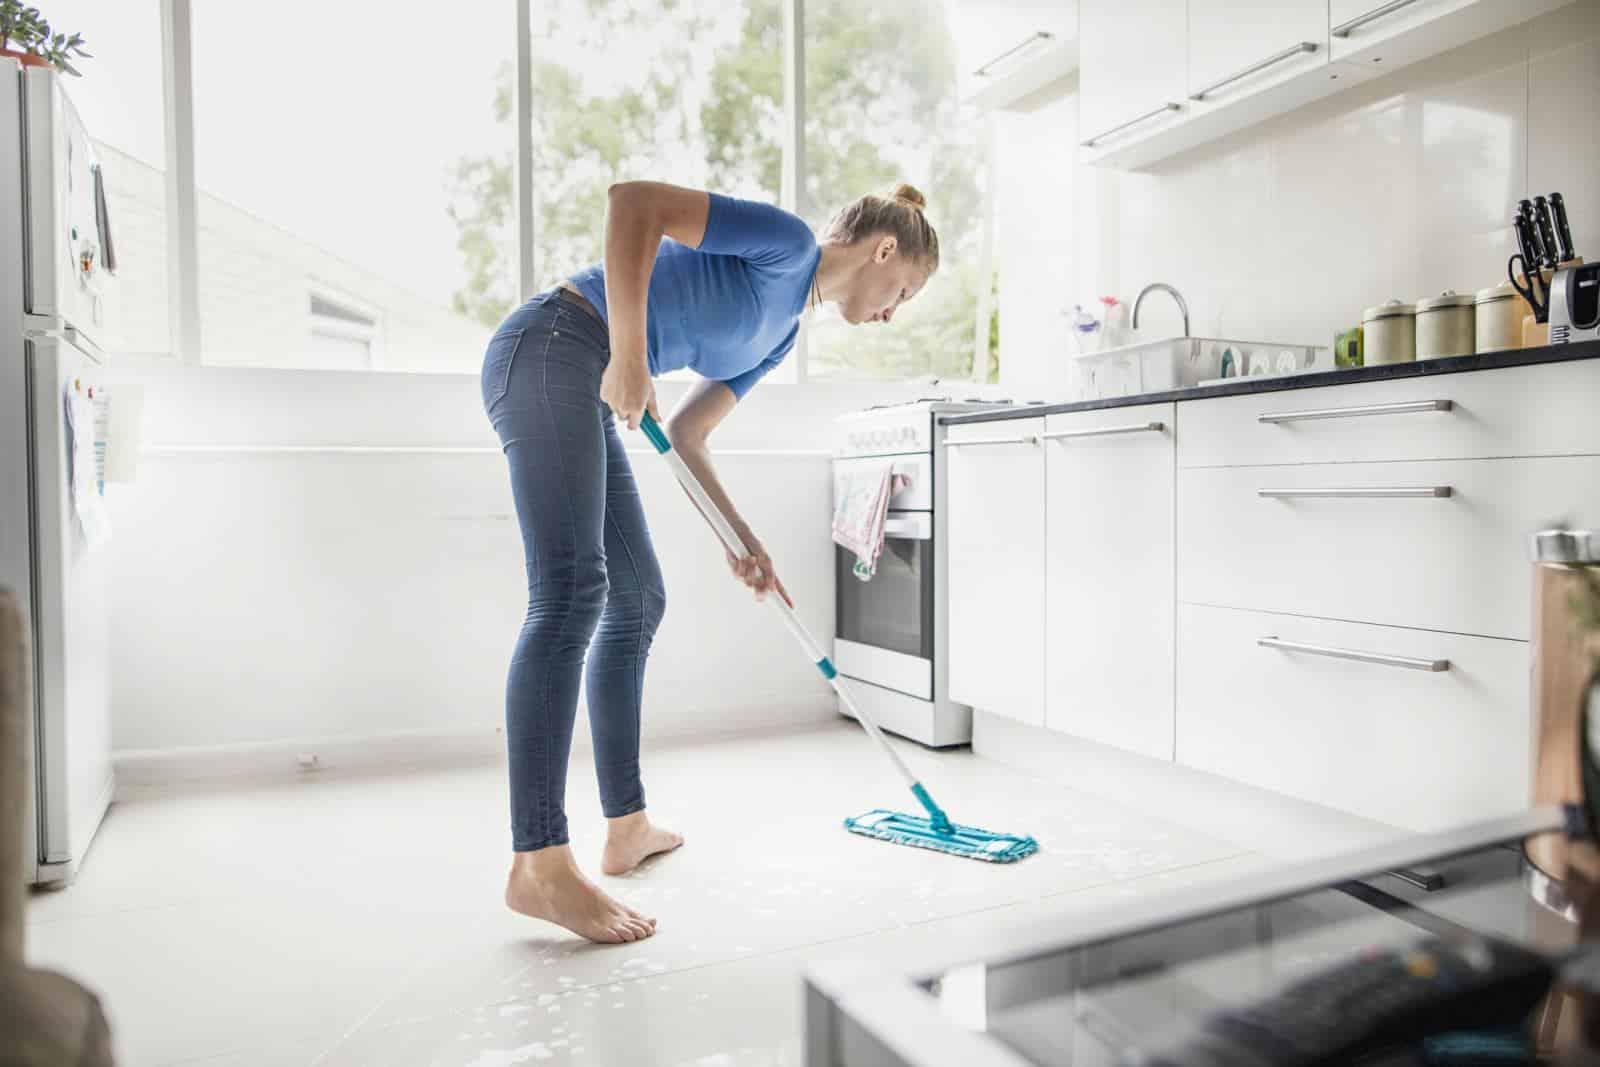 How to Clean Ceramic Tile Floors | LoveToKnow